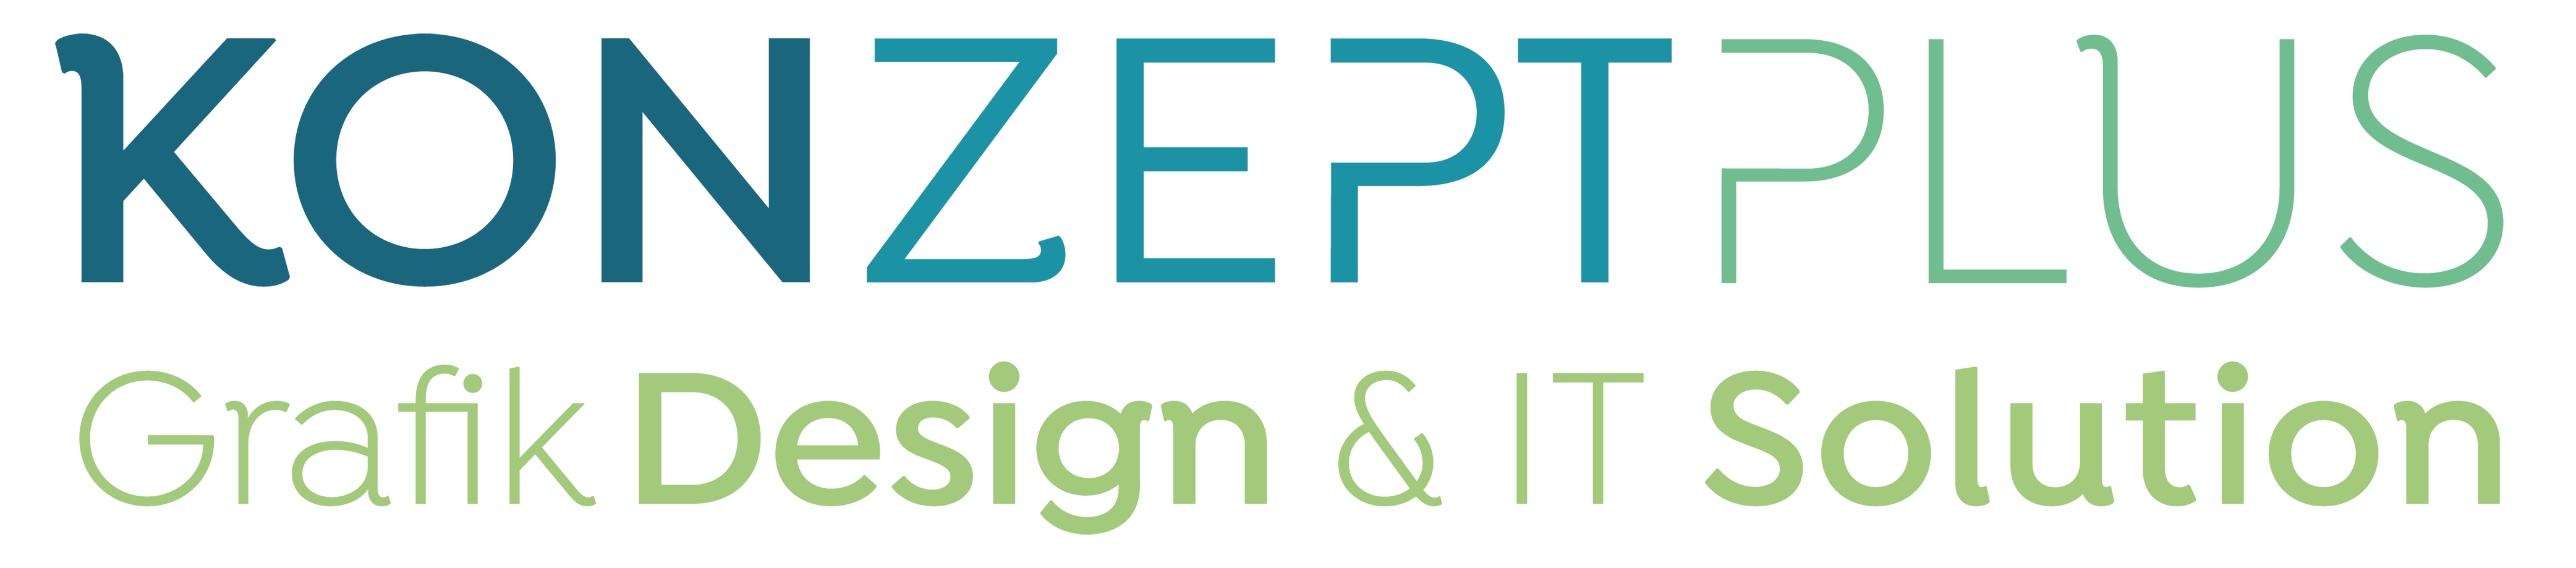 Konzeptplus Gmbh logo